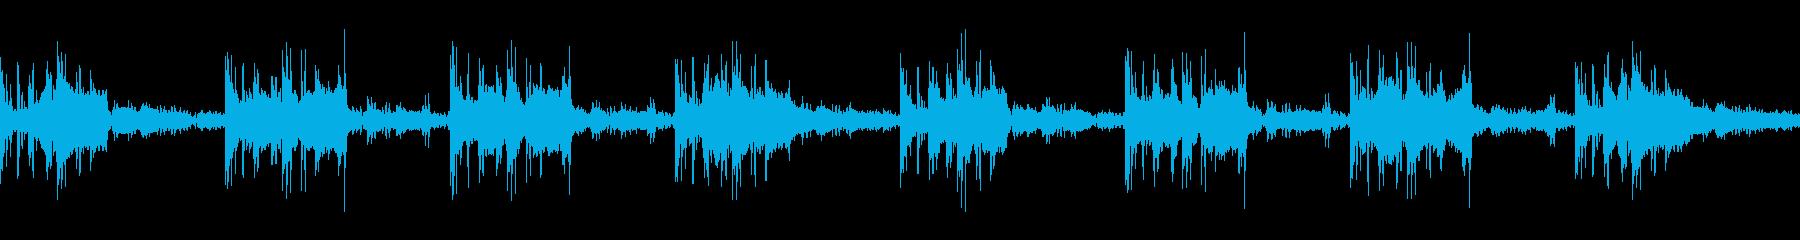 Robot / SF game loop BGM2's reproduced waveform